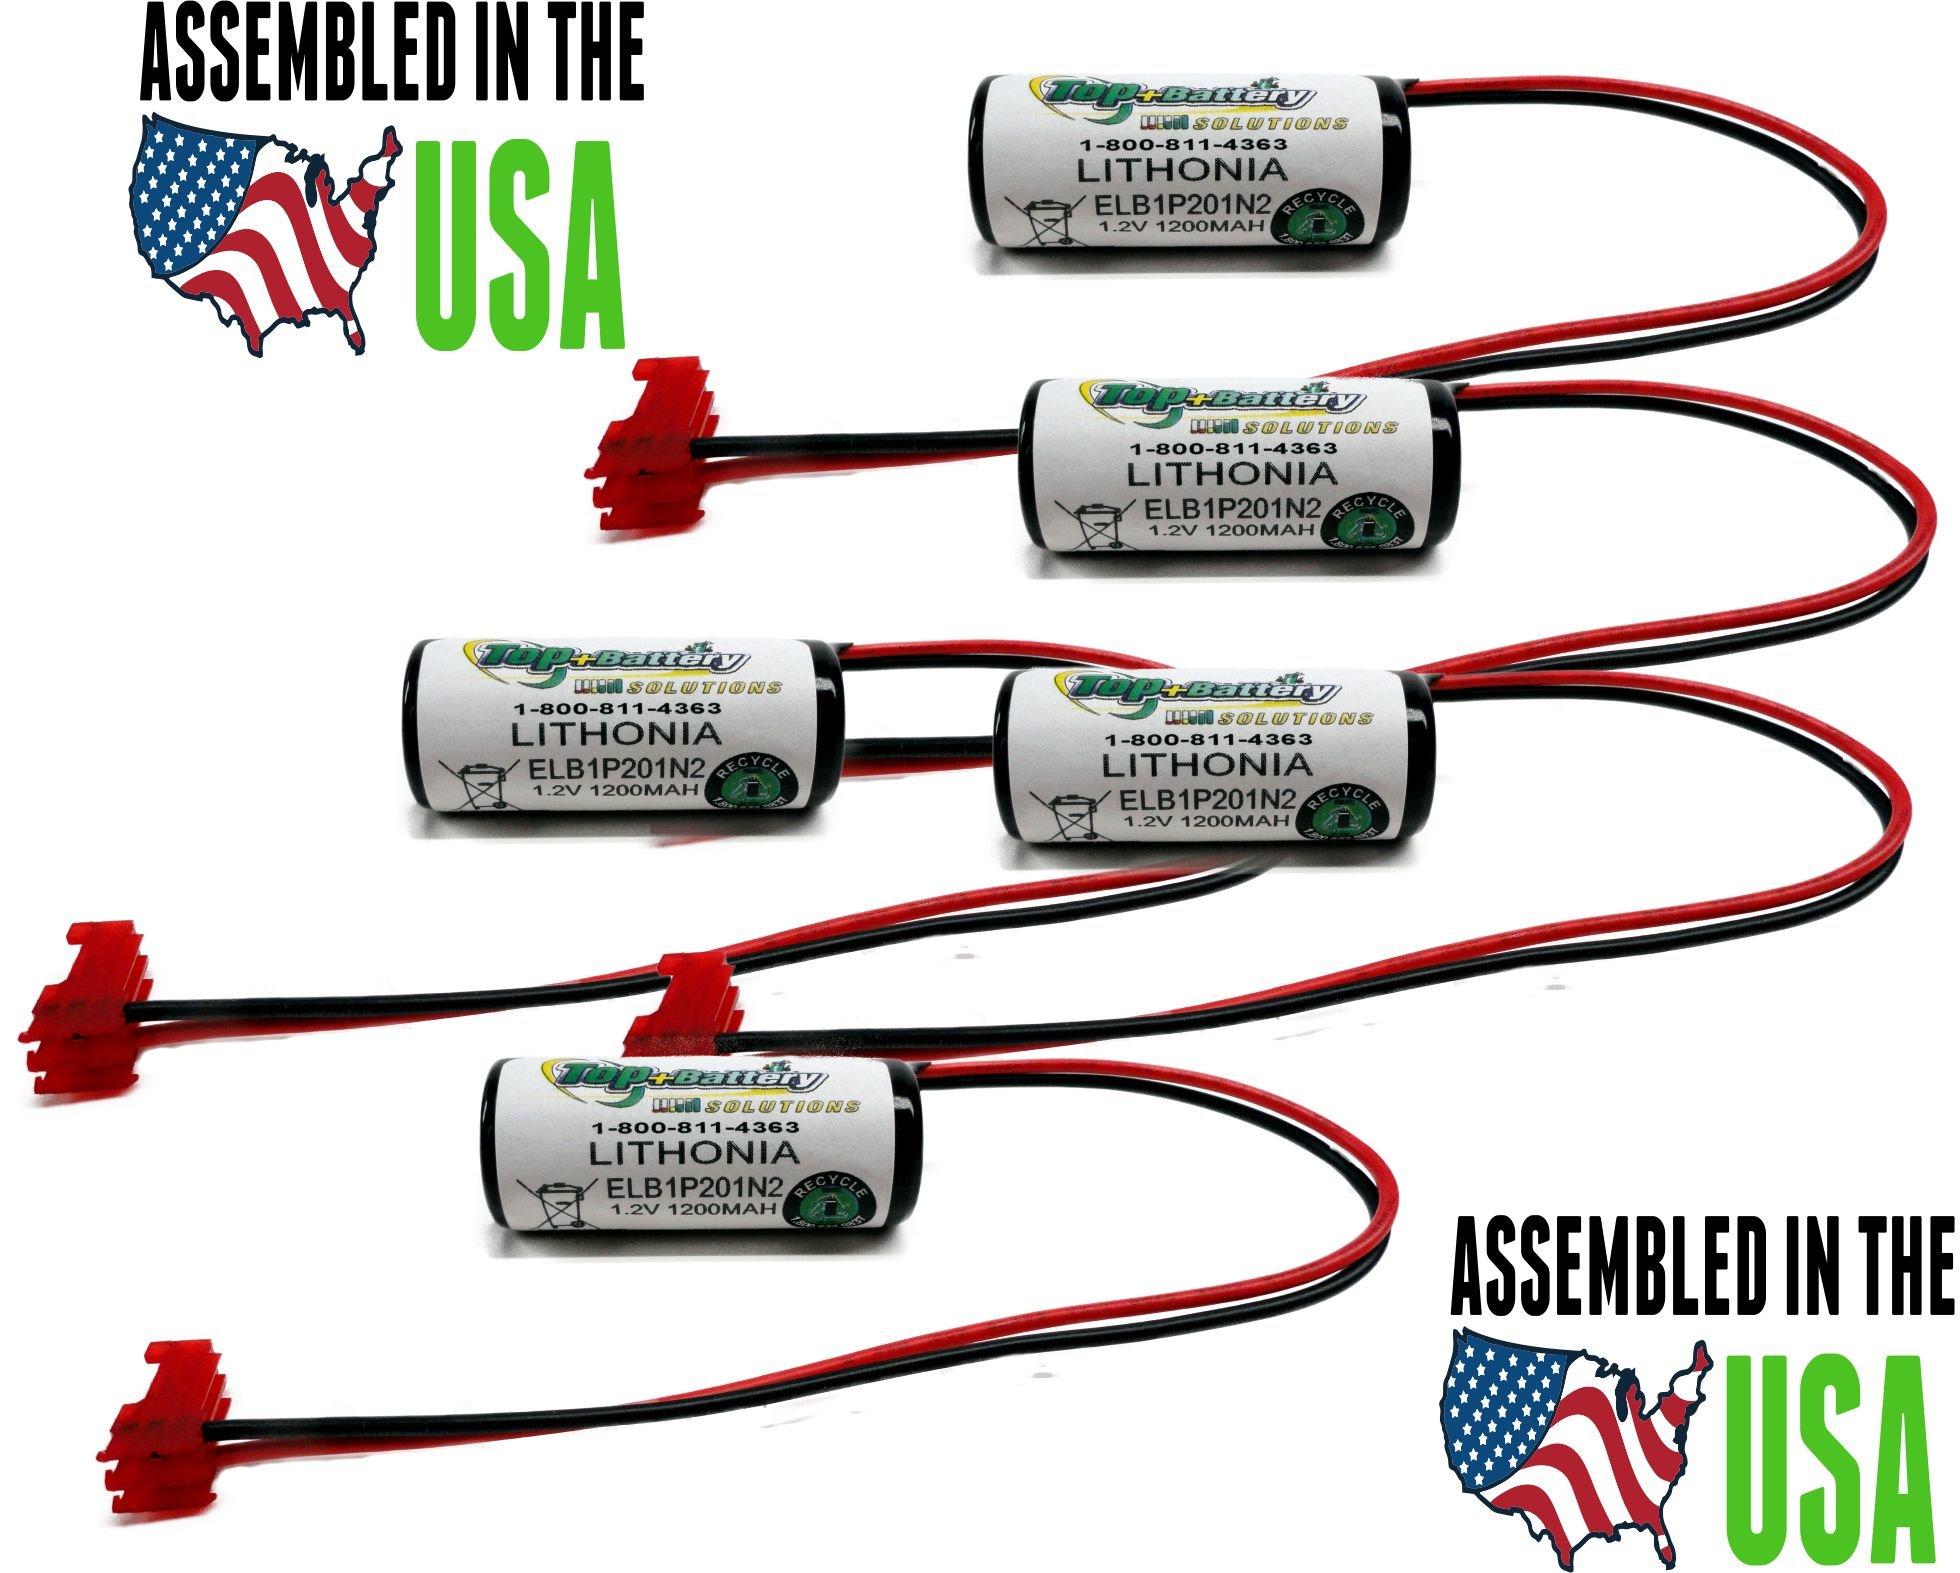 5pc Lithonia Emergency Lighting Battery for Model ELB1P201N, ELB1P201N2